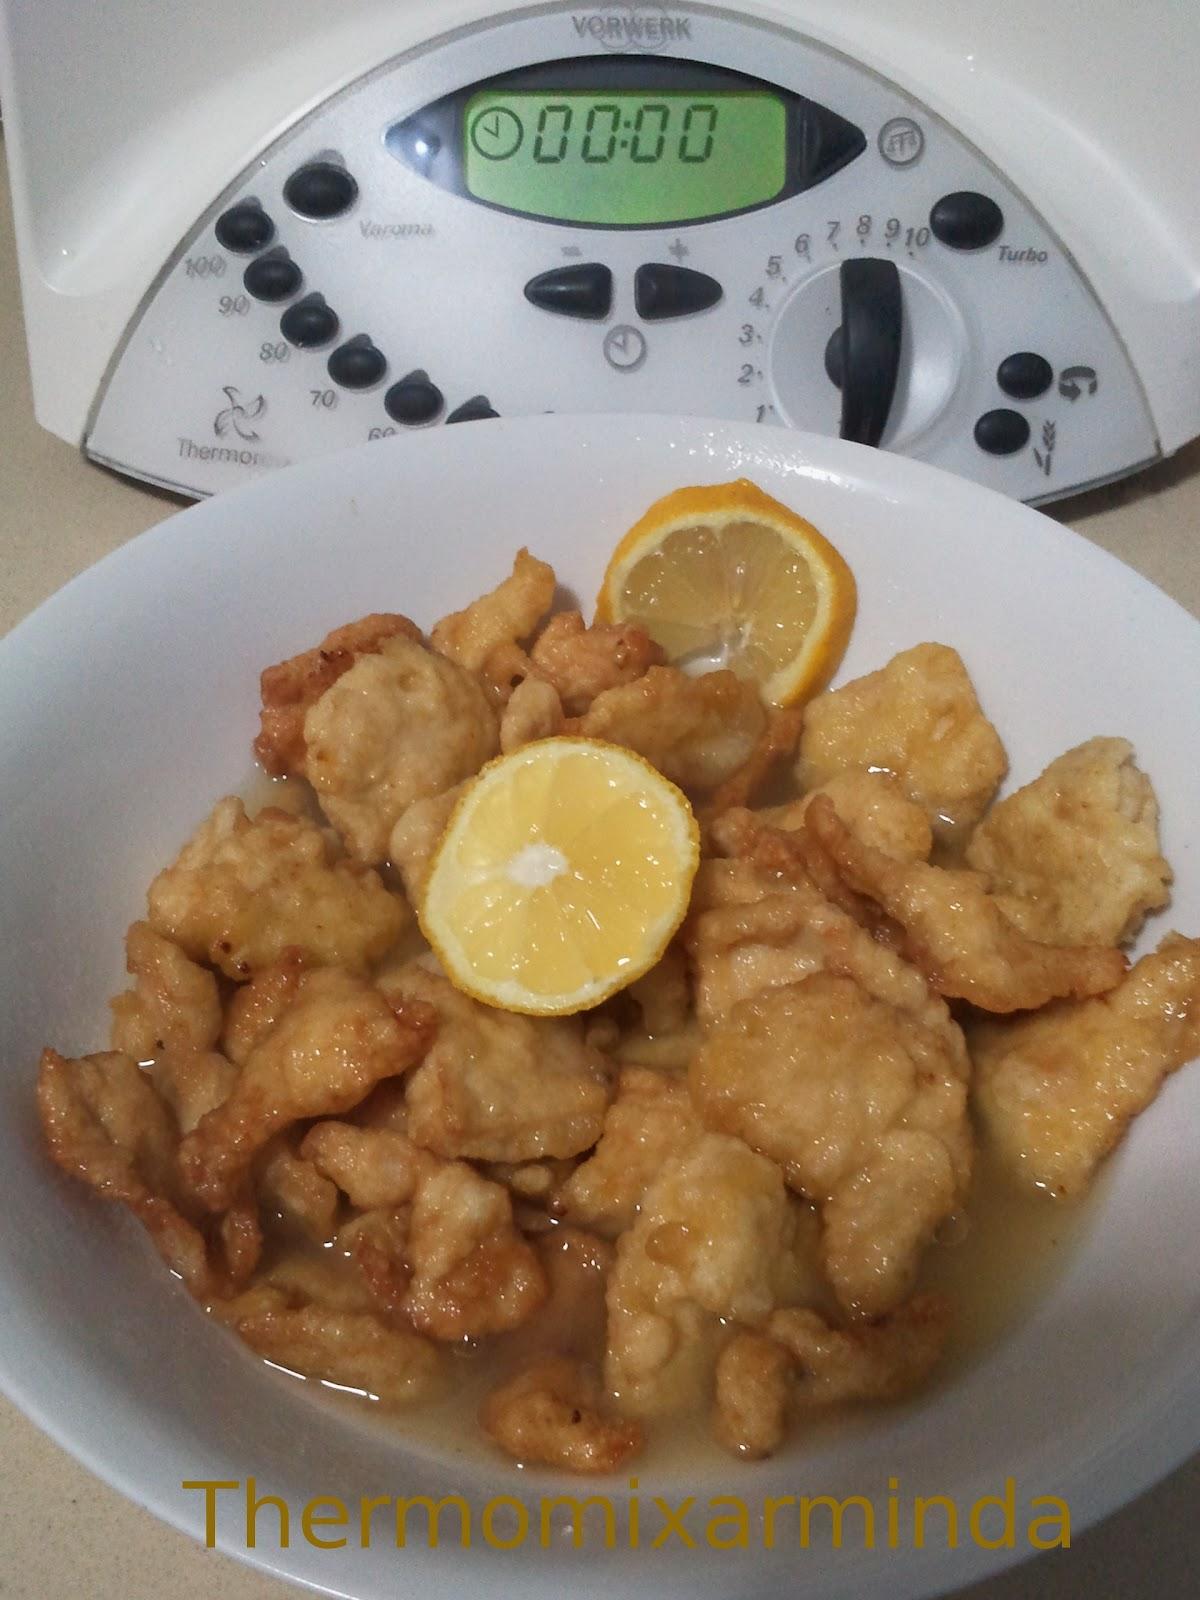 Pollo al lim n al estilo chino thermomix utilizando thermomix cocina f cil y barata - Cocina facil y saludable thermomix ...